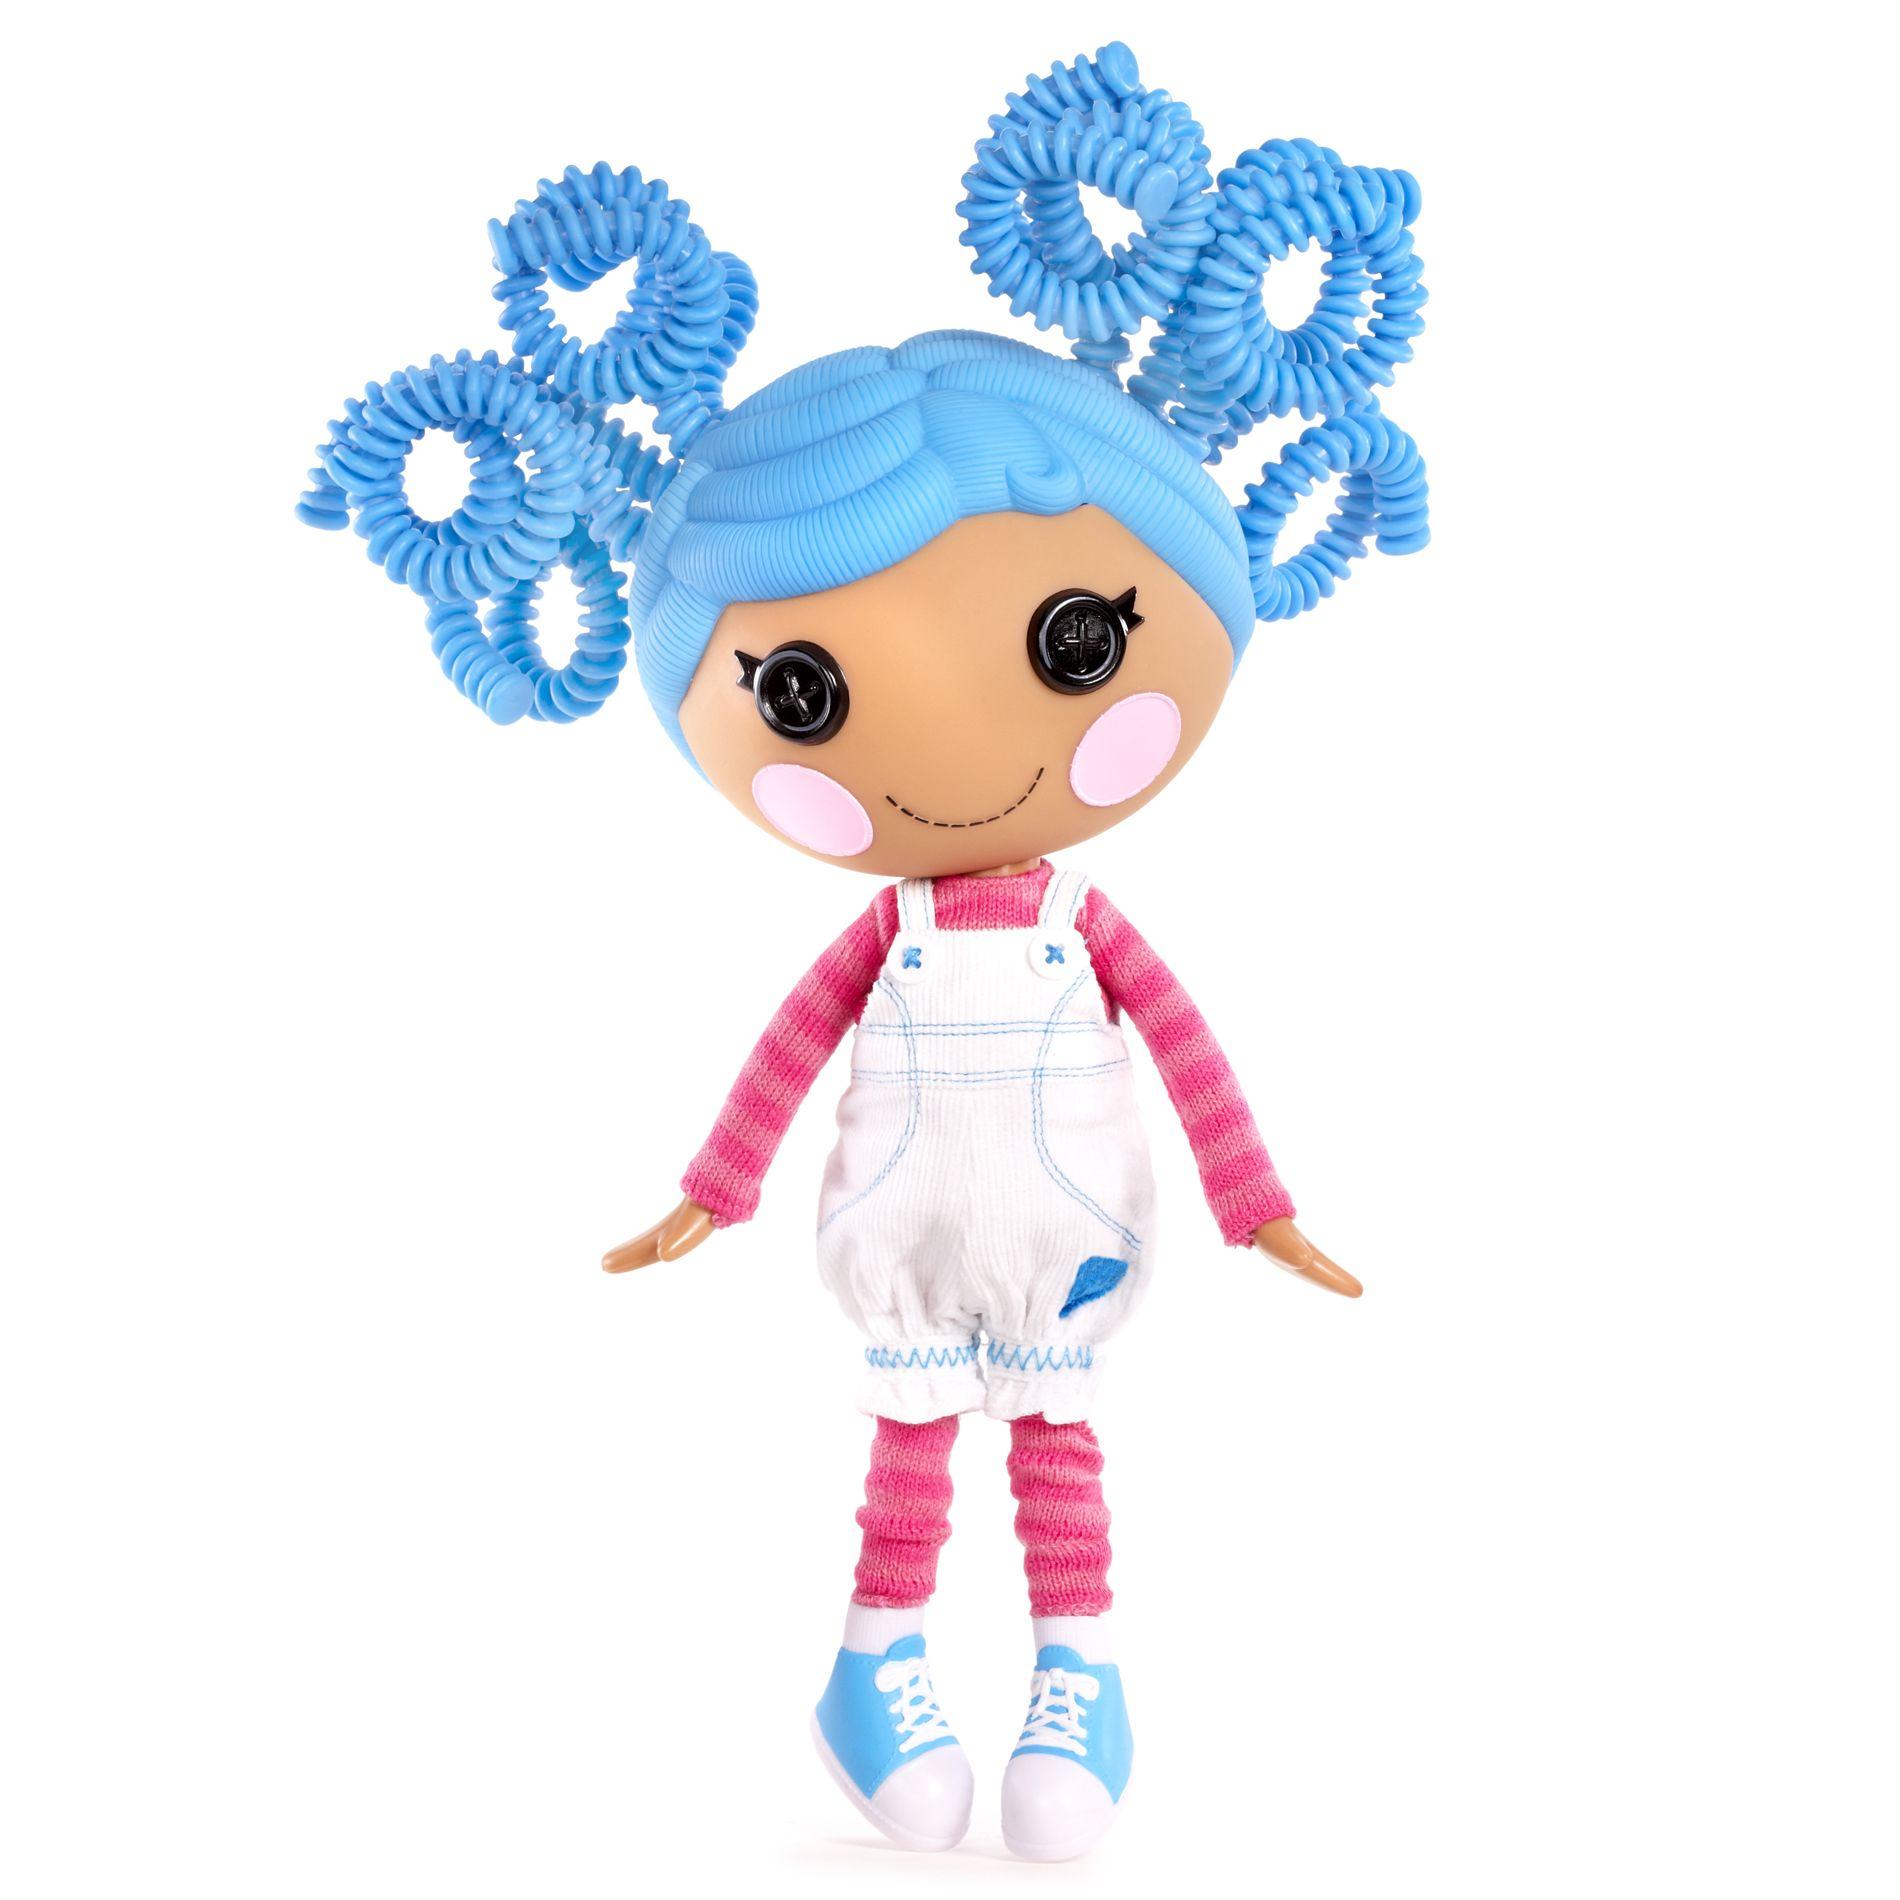 Lalaloopsy Doll The World Of Lalaloopsy From Kmart